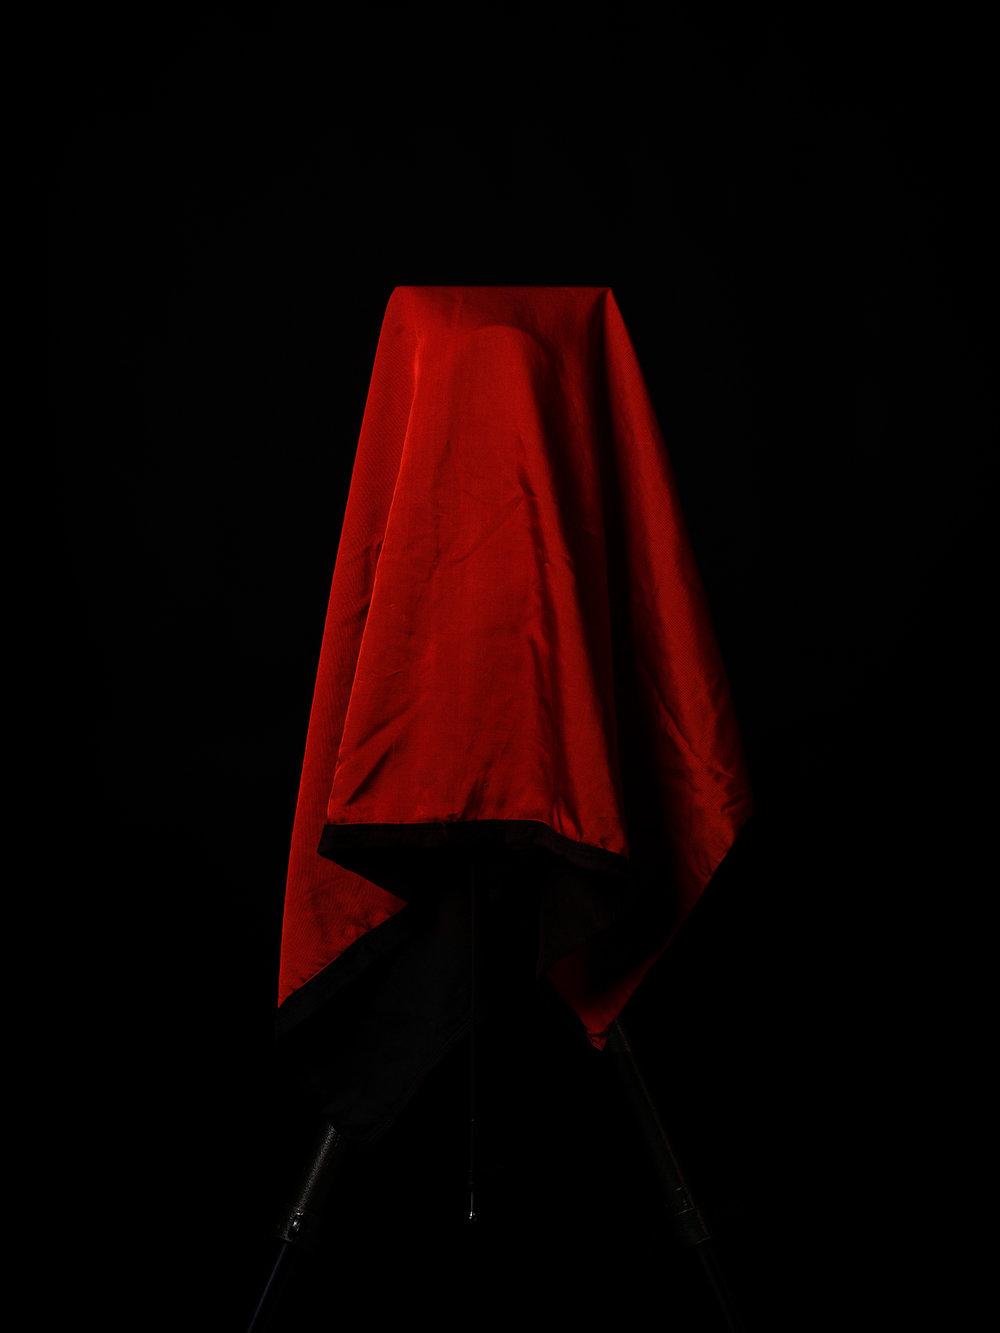 Veil - Sean Padraic Birnie